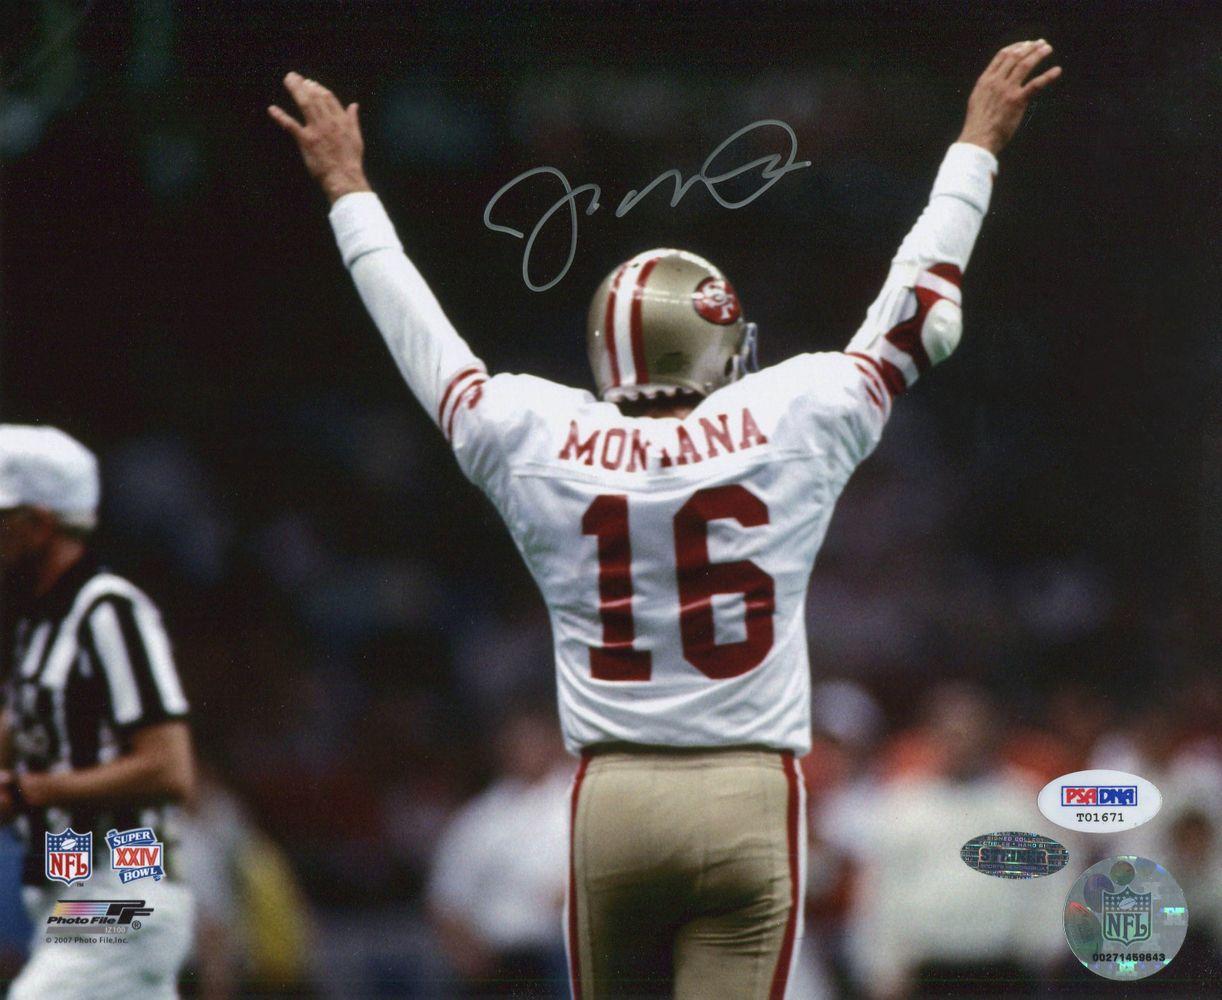 finest selection 95073 ff0b5 Football - Joe Montana - Images | PSA AutographFacts™